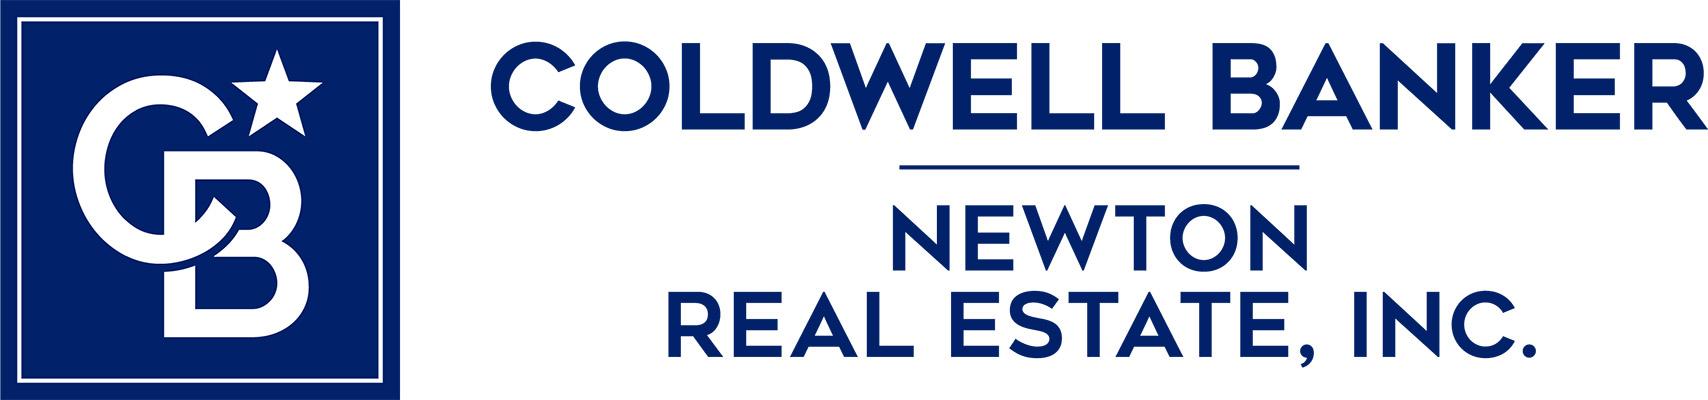 Coldwell Banker Newton Real Estate, Inc LOGO